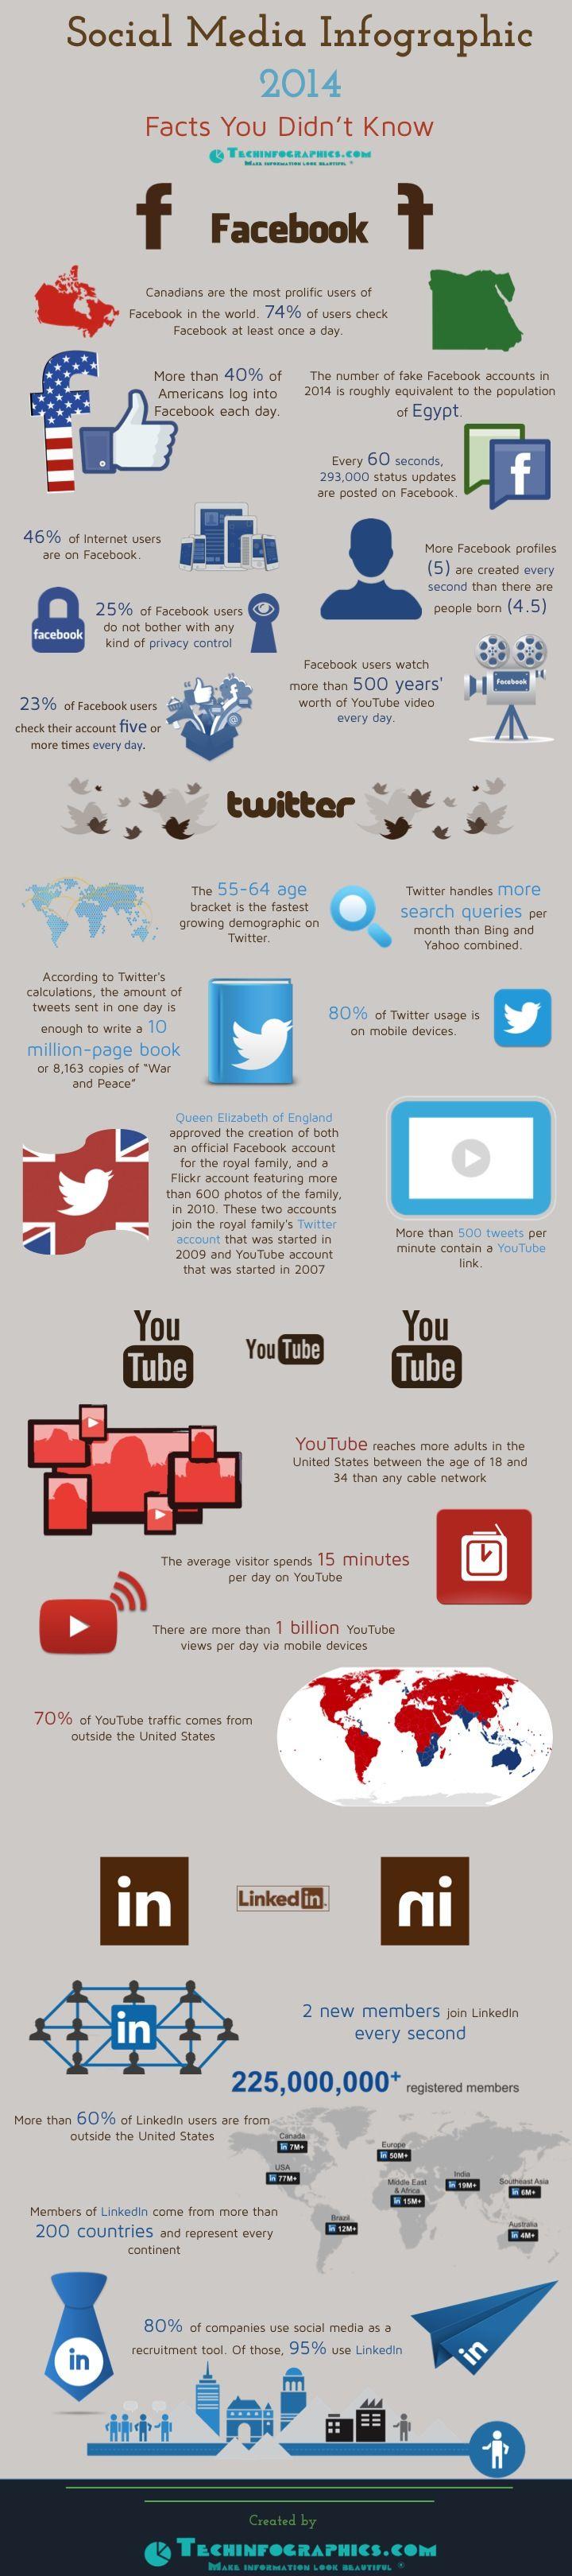 SOCIAL MEDIA -         SocialMedia 2014 - Facts You Didn't Know.